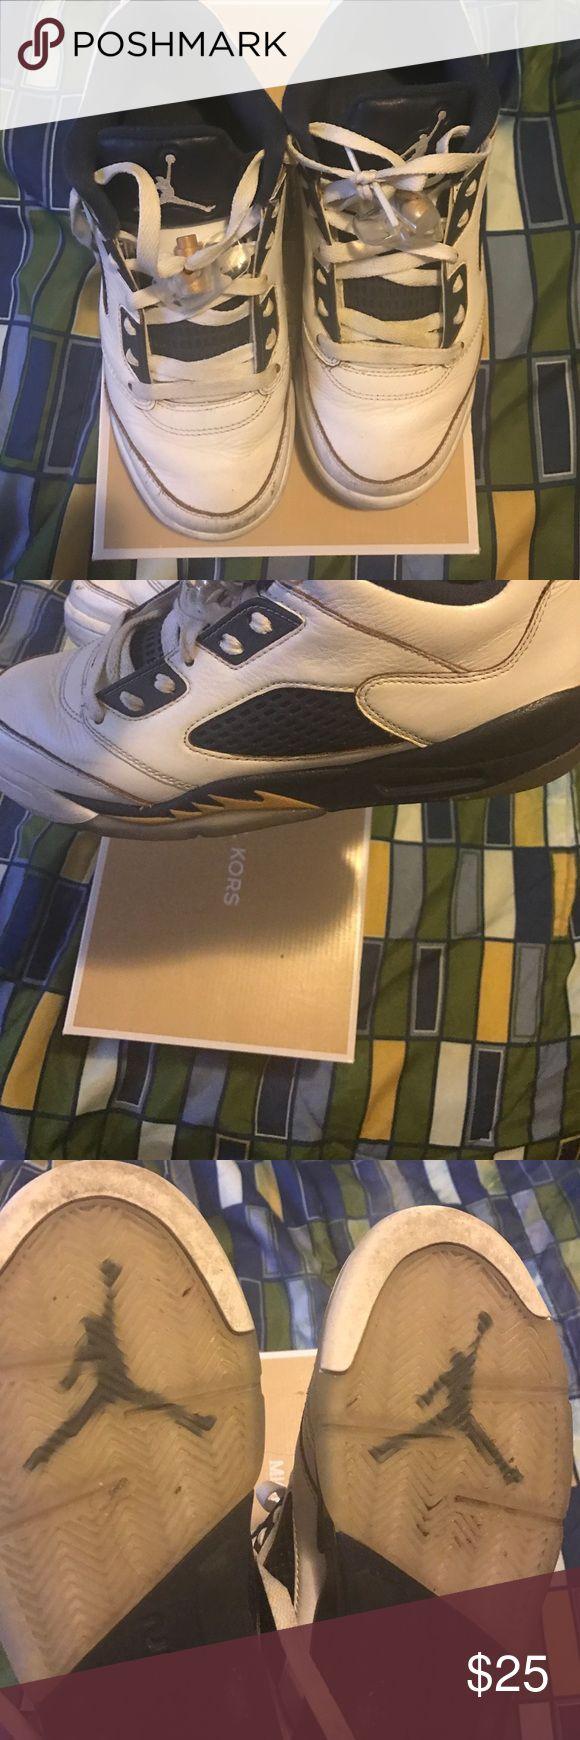 Air Jordan Low Sz 6.5Y Used Jordans for Kids air jordan Shoes Sneakers